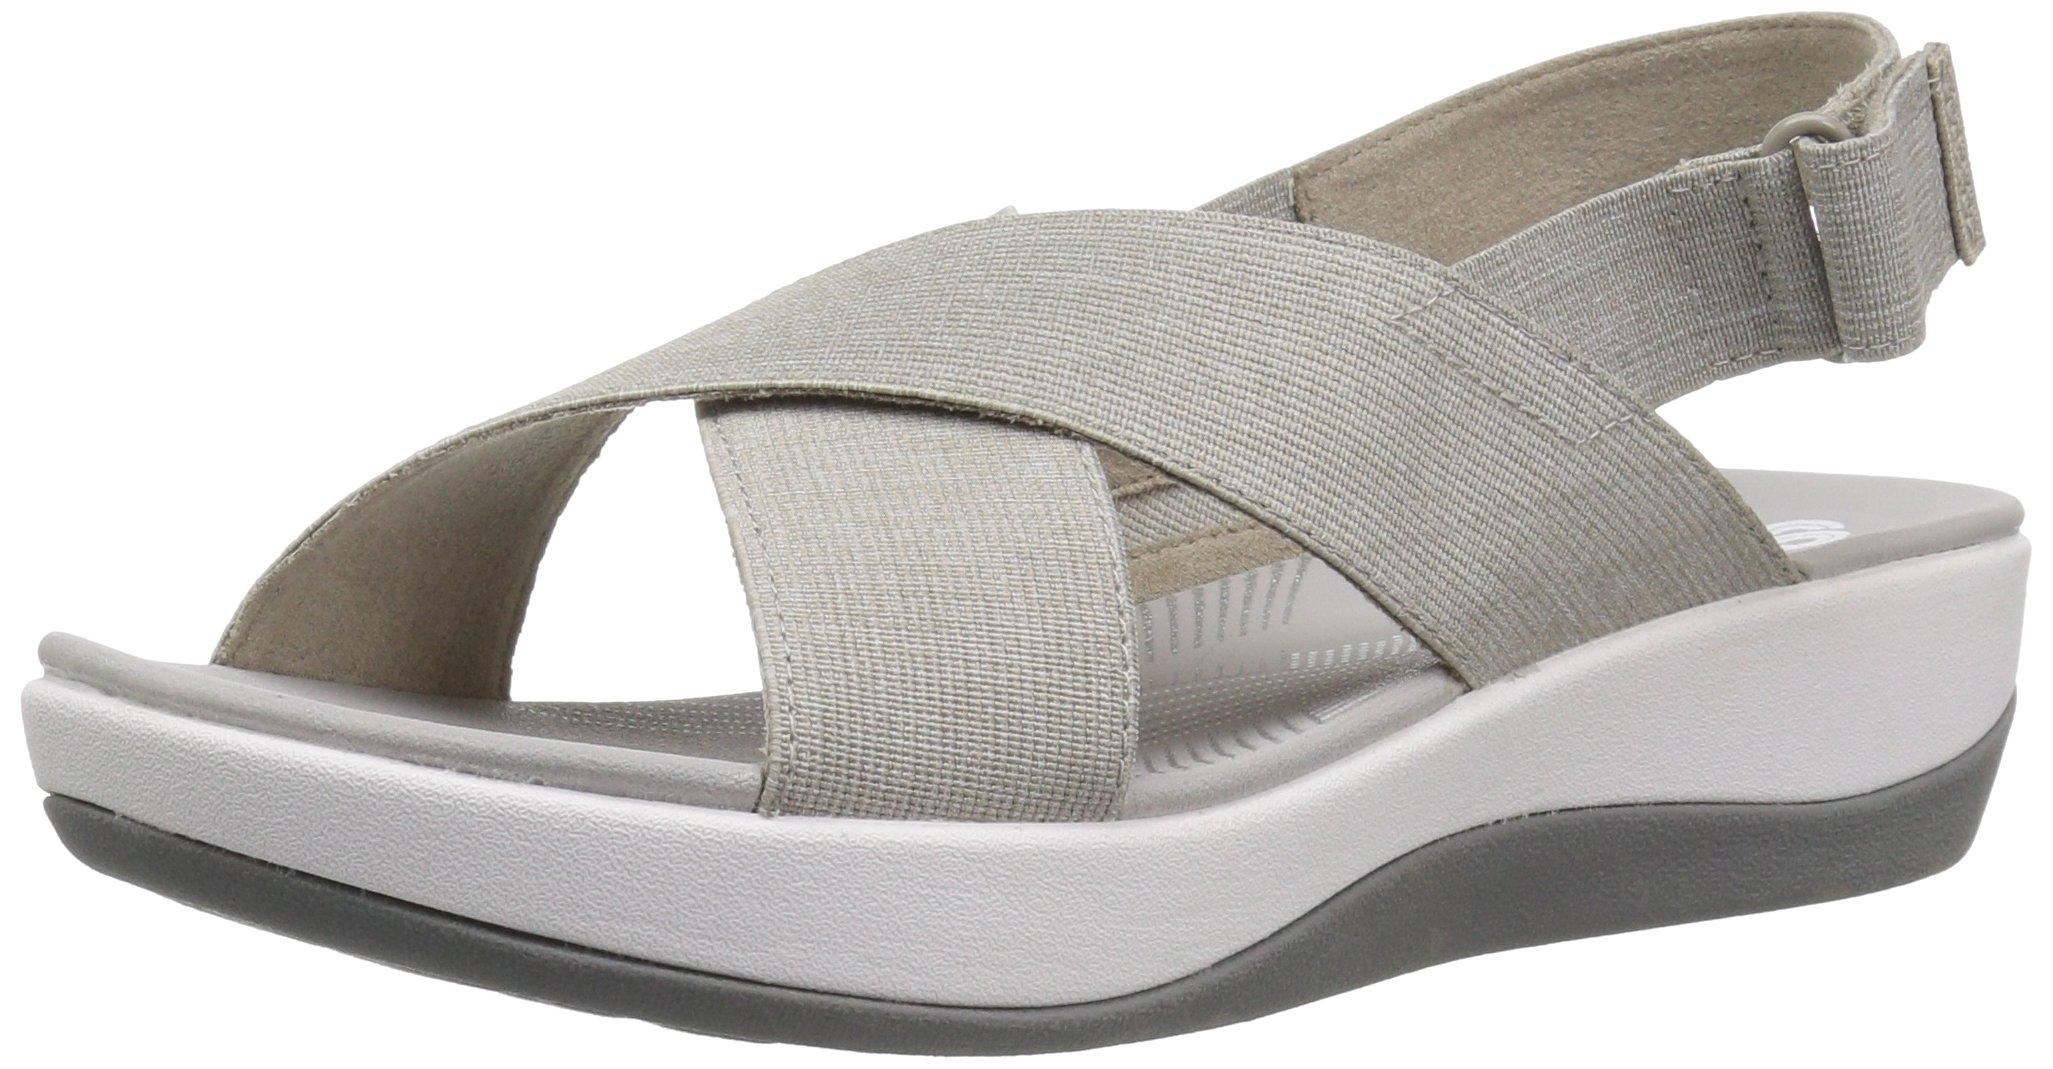 CLARKS Women's Arla Kaydin Sandal, Sand/White Heathered Elastic, 9 Wide US